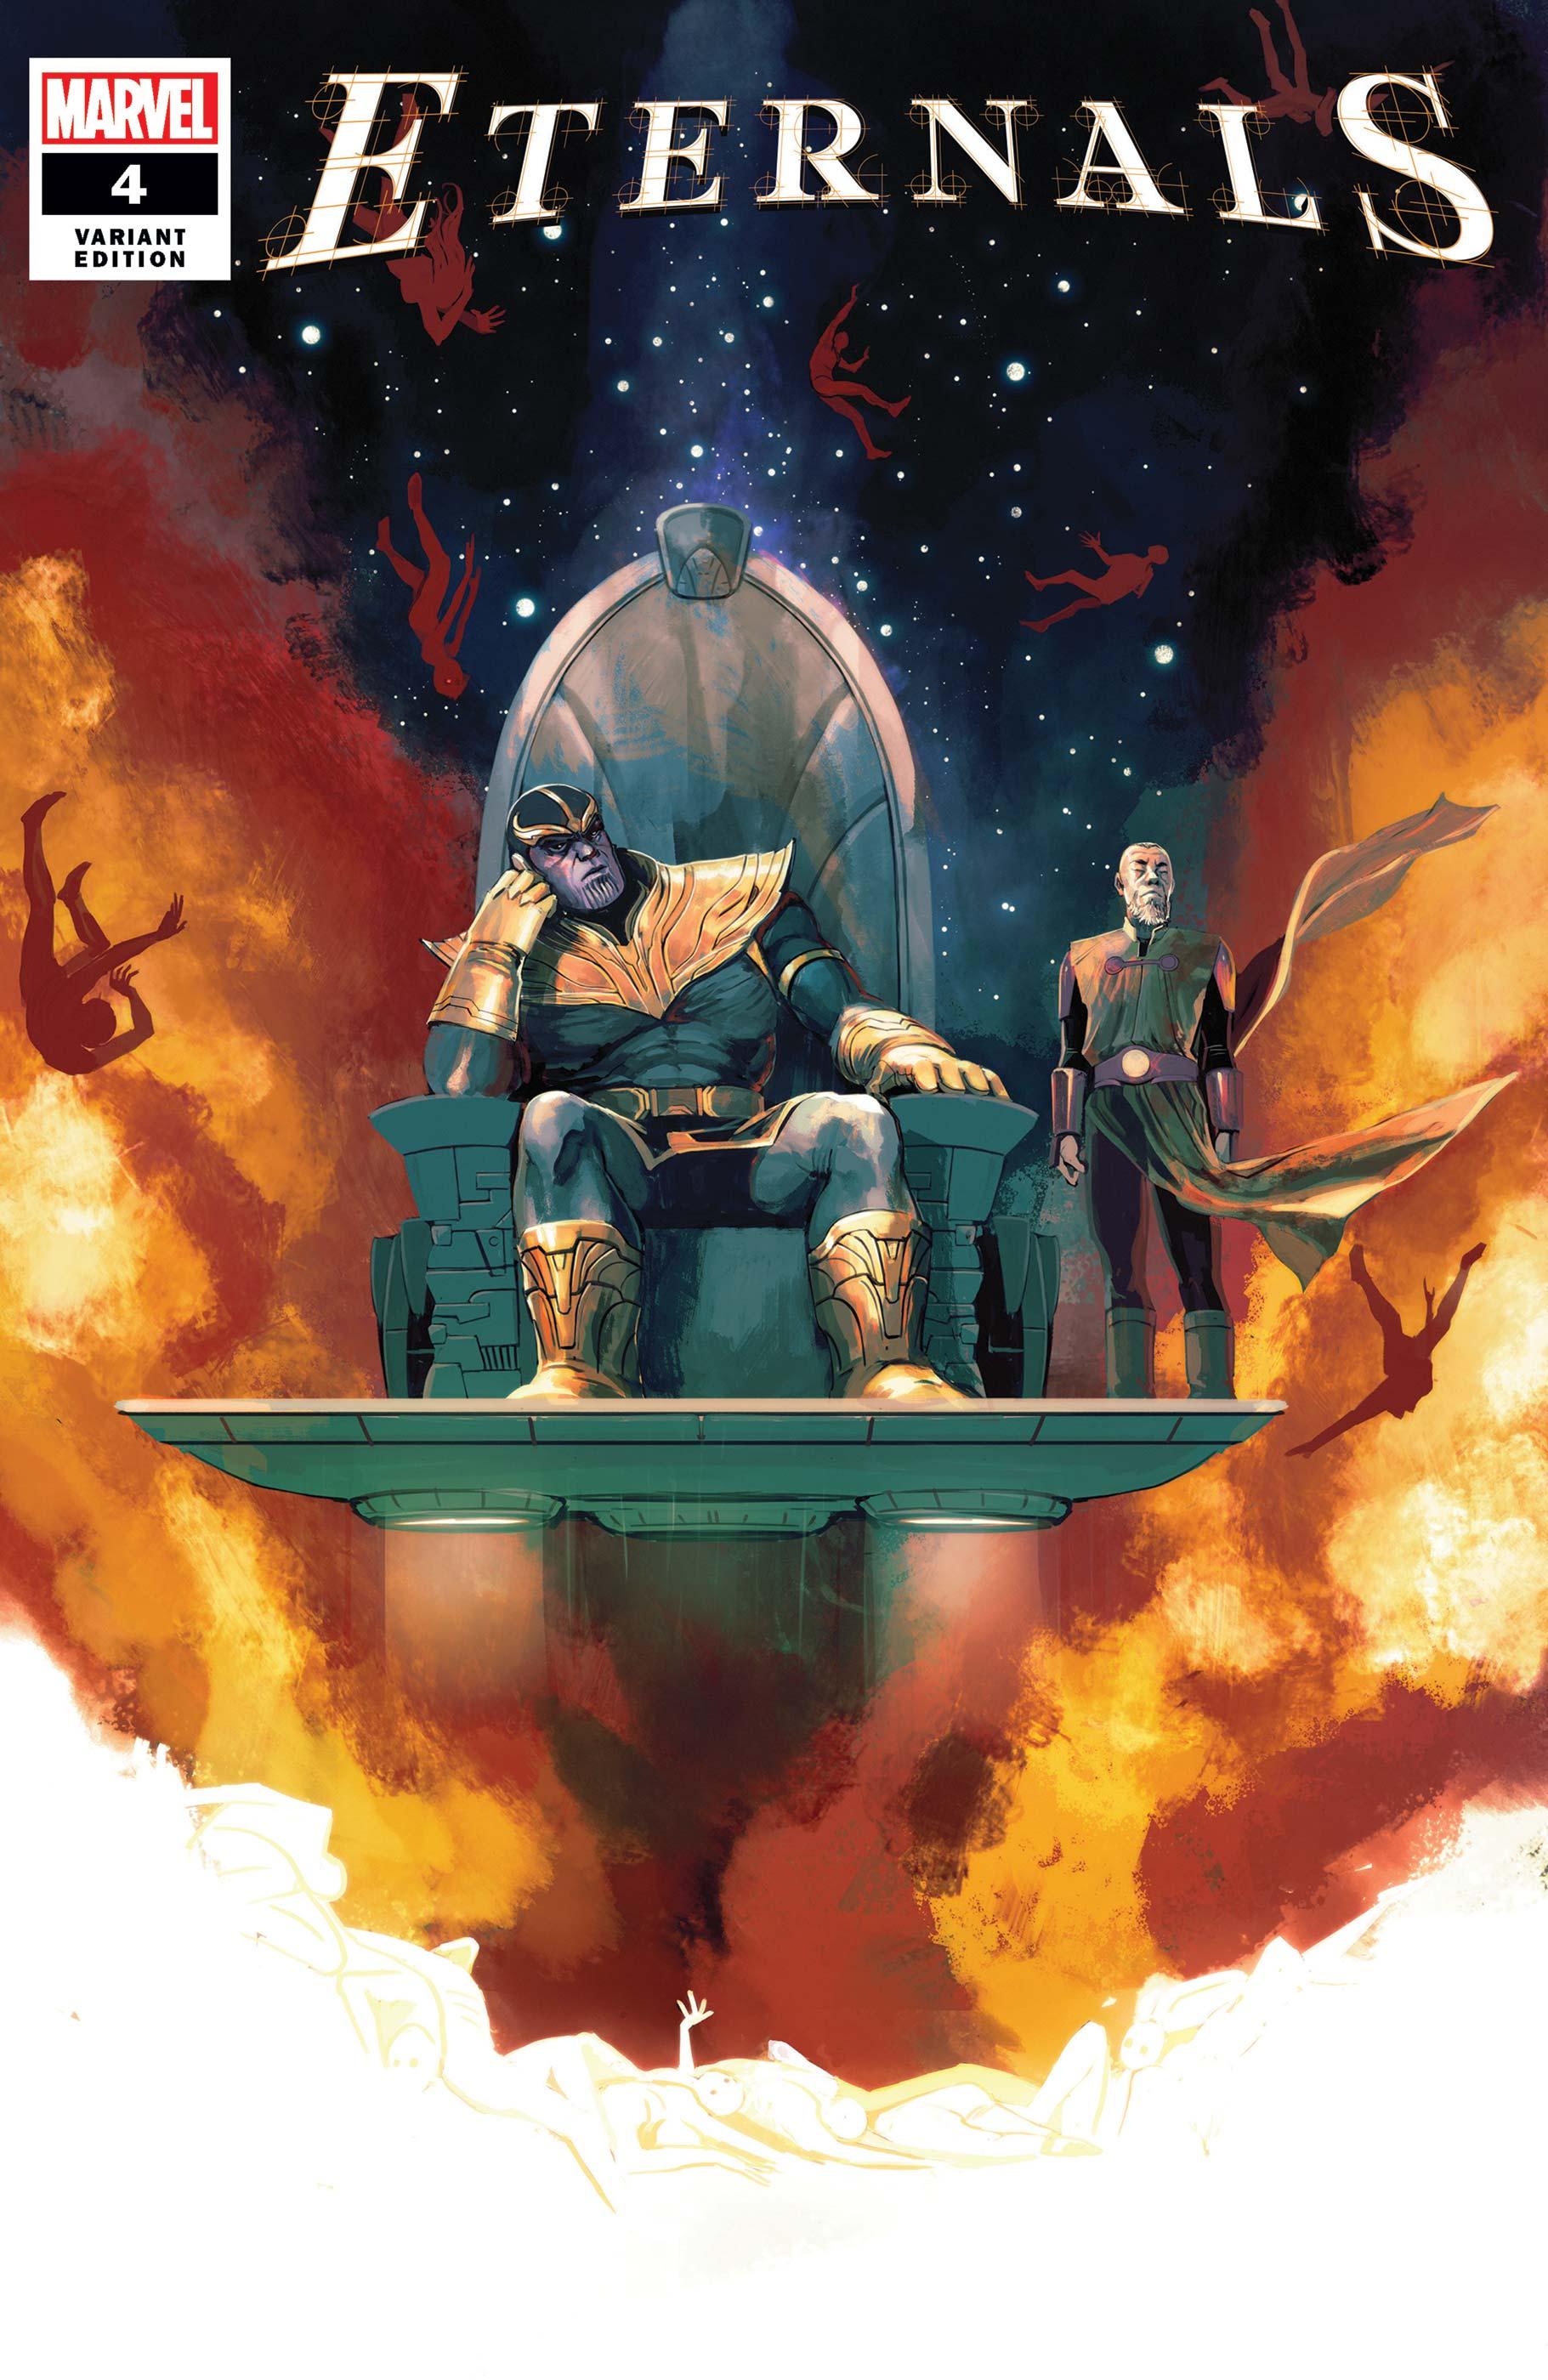 Eternals (2021) #4 (Variant)